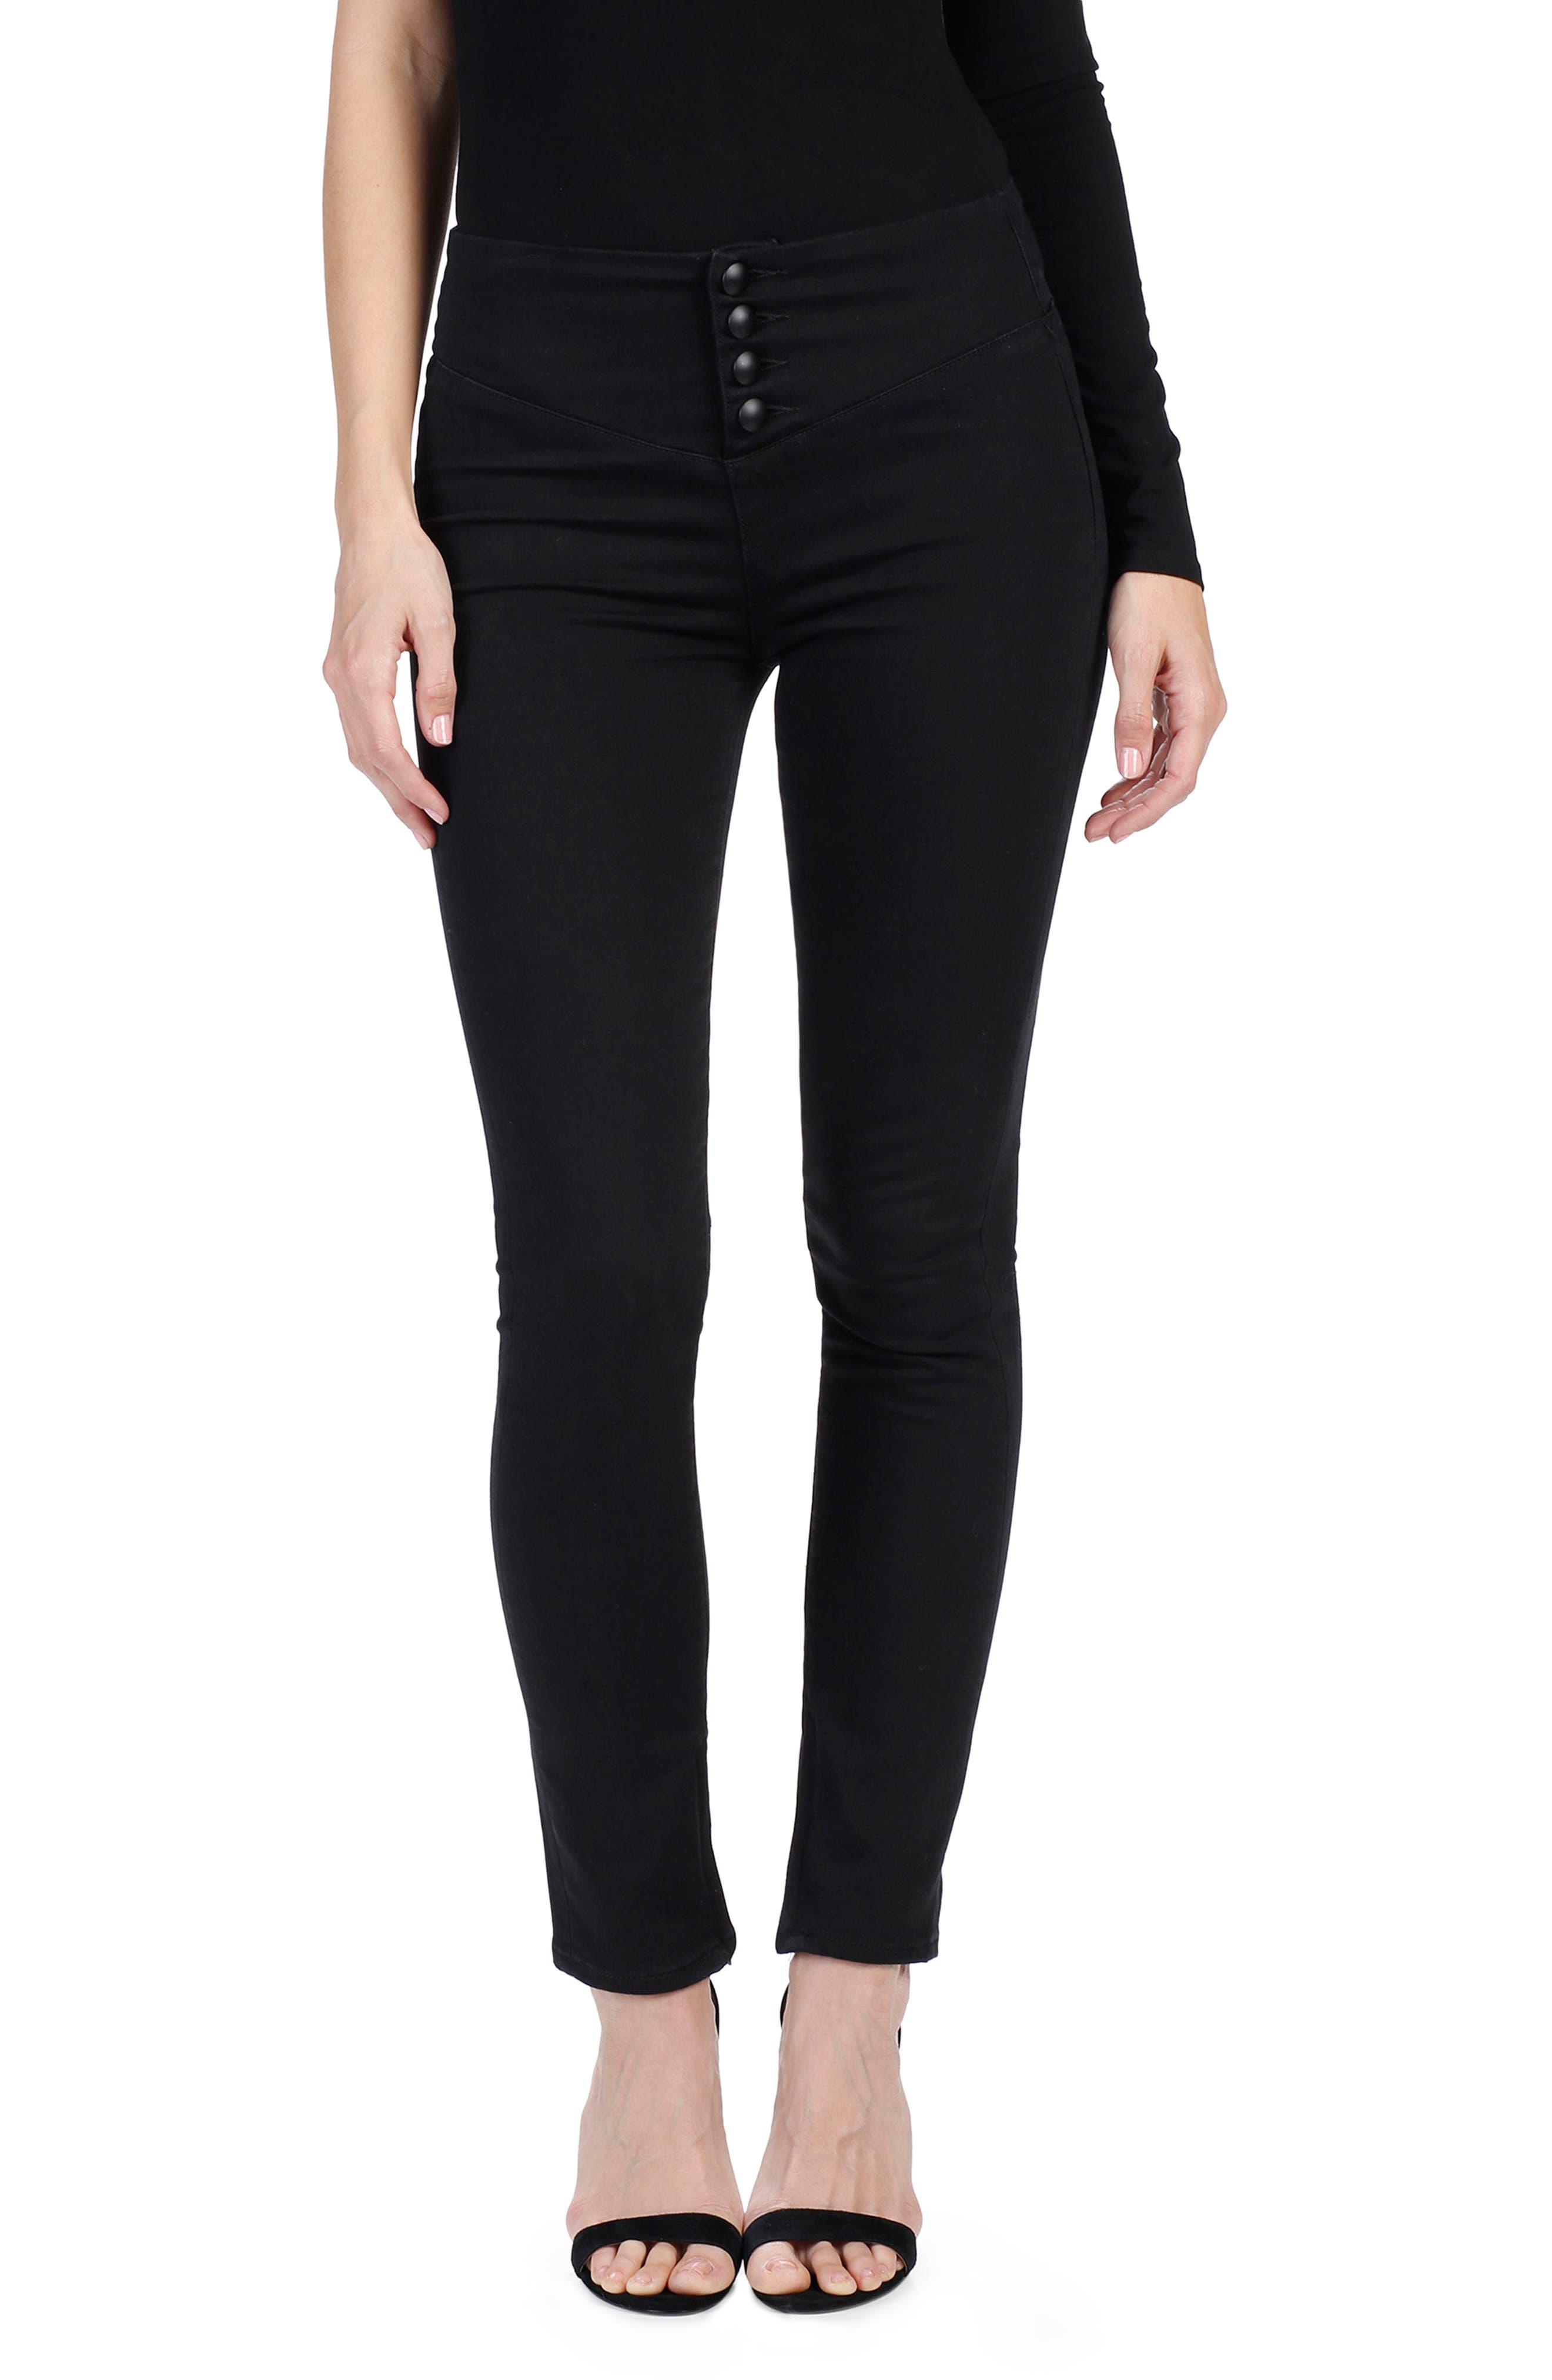 Rosie HW x PAIGE Ellery Skinny Jeans,                             Main thumbnail 1, color,                             Onyx